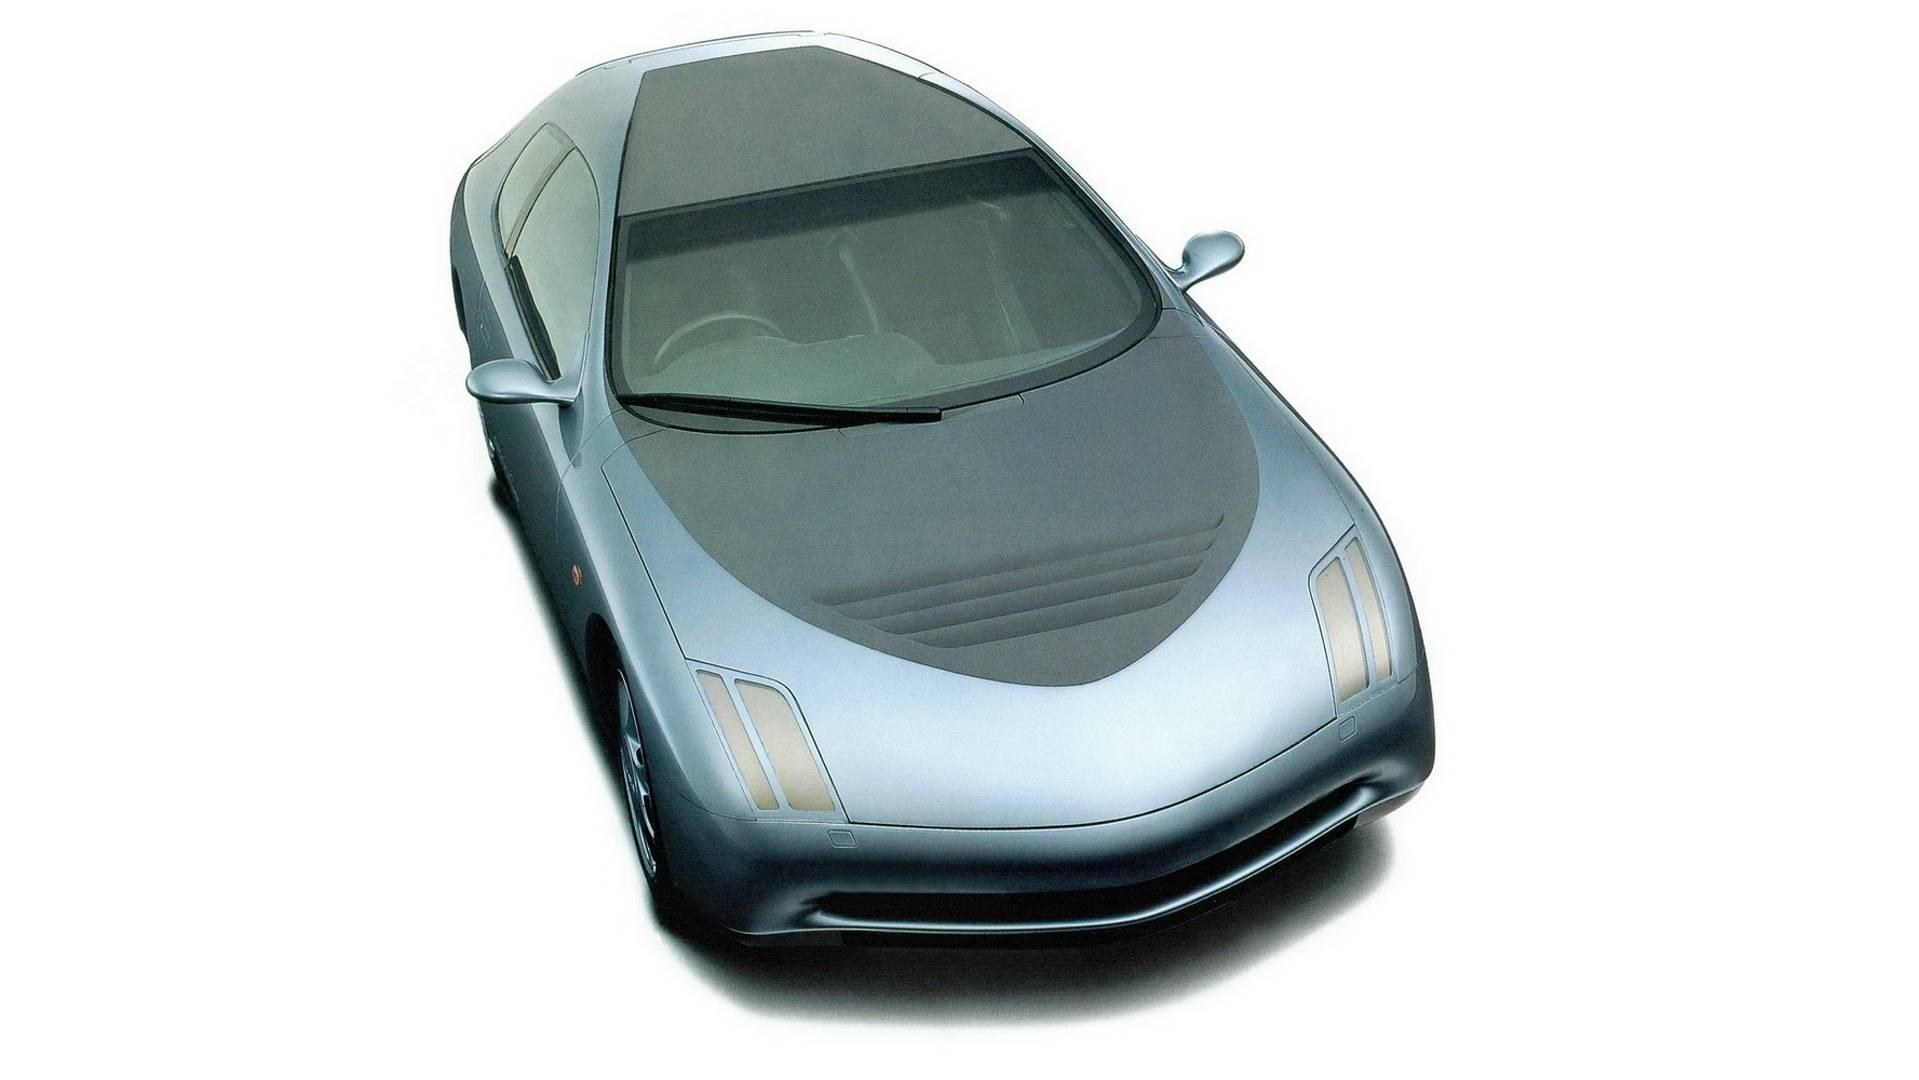 1989 toyota 4500gt تویوتا ۴۵۰۰ جی تی ، نقد بررسی این خودرو   اجاره ماشین